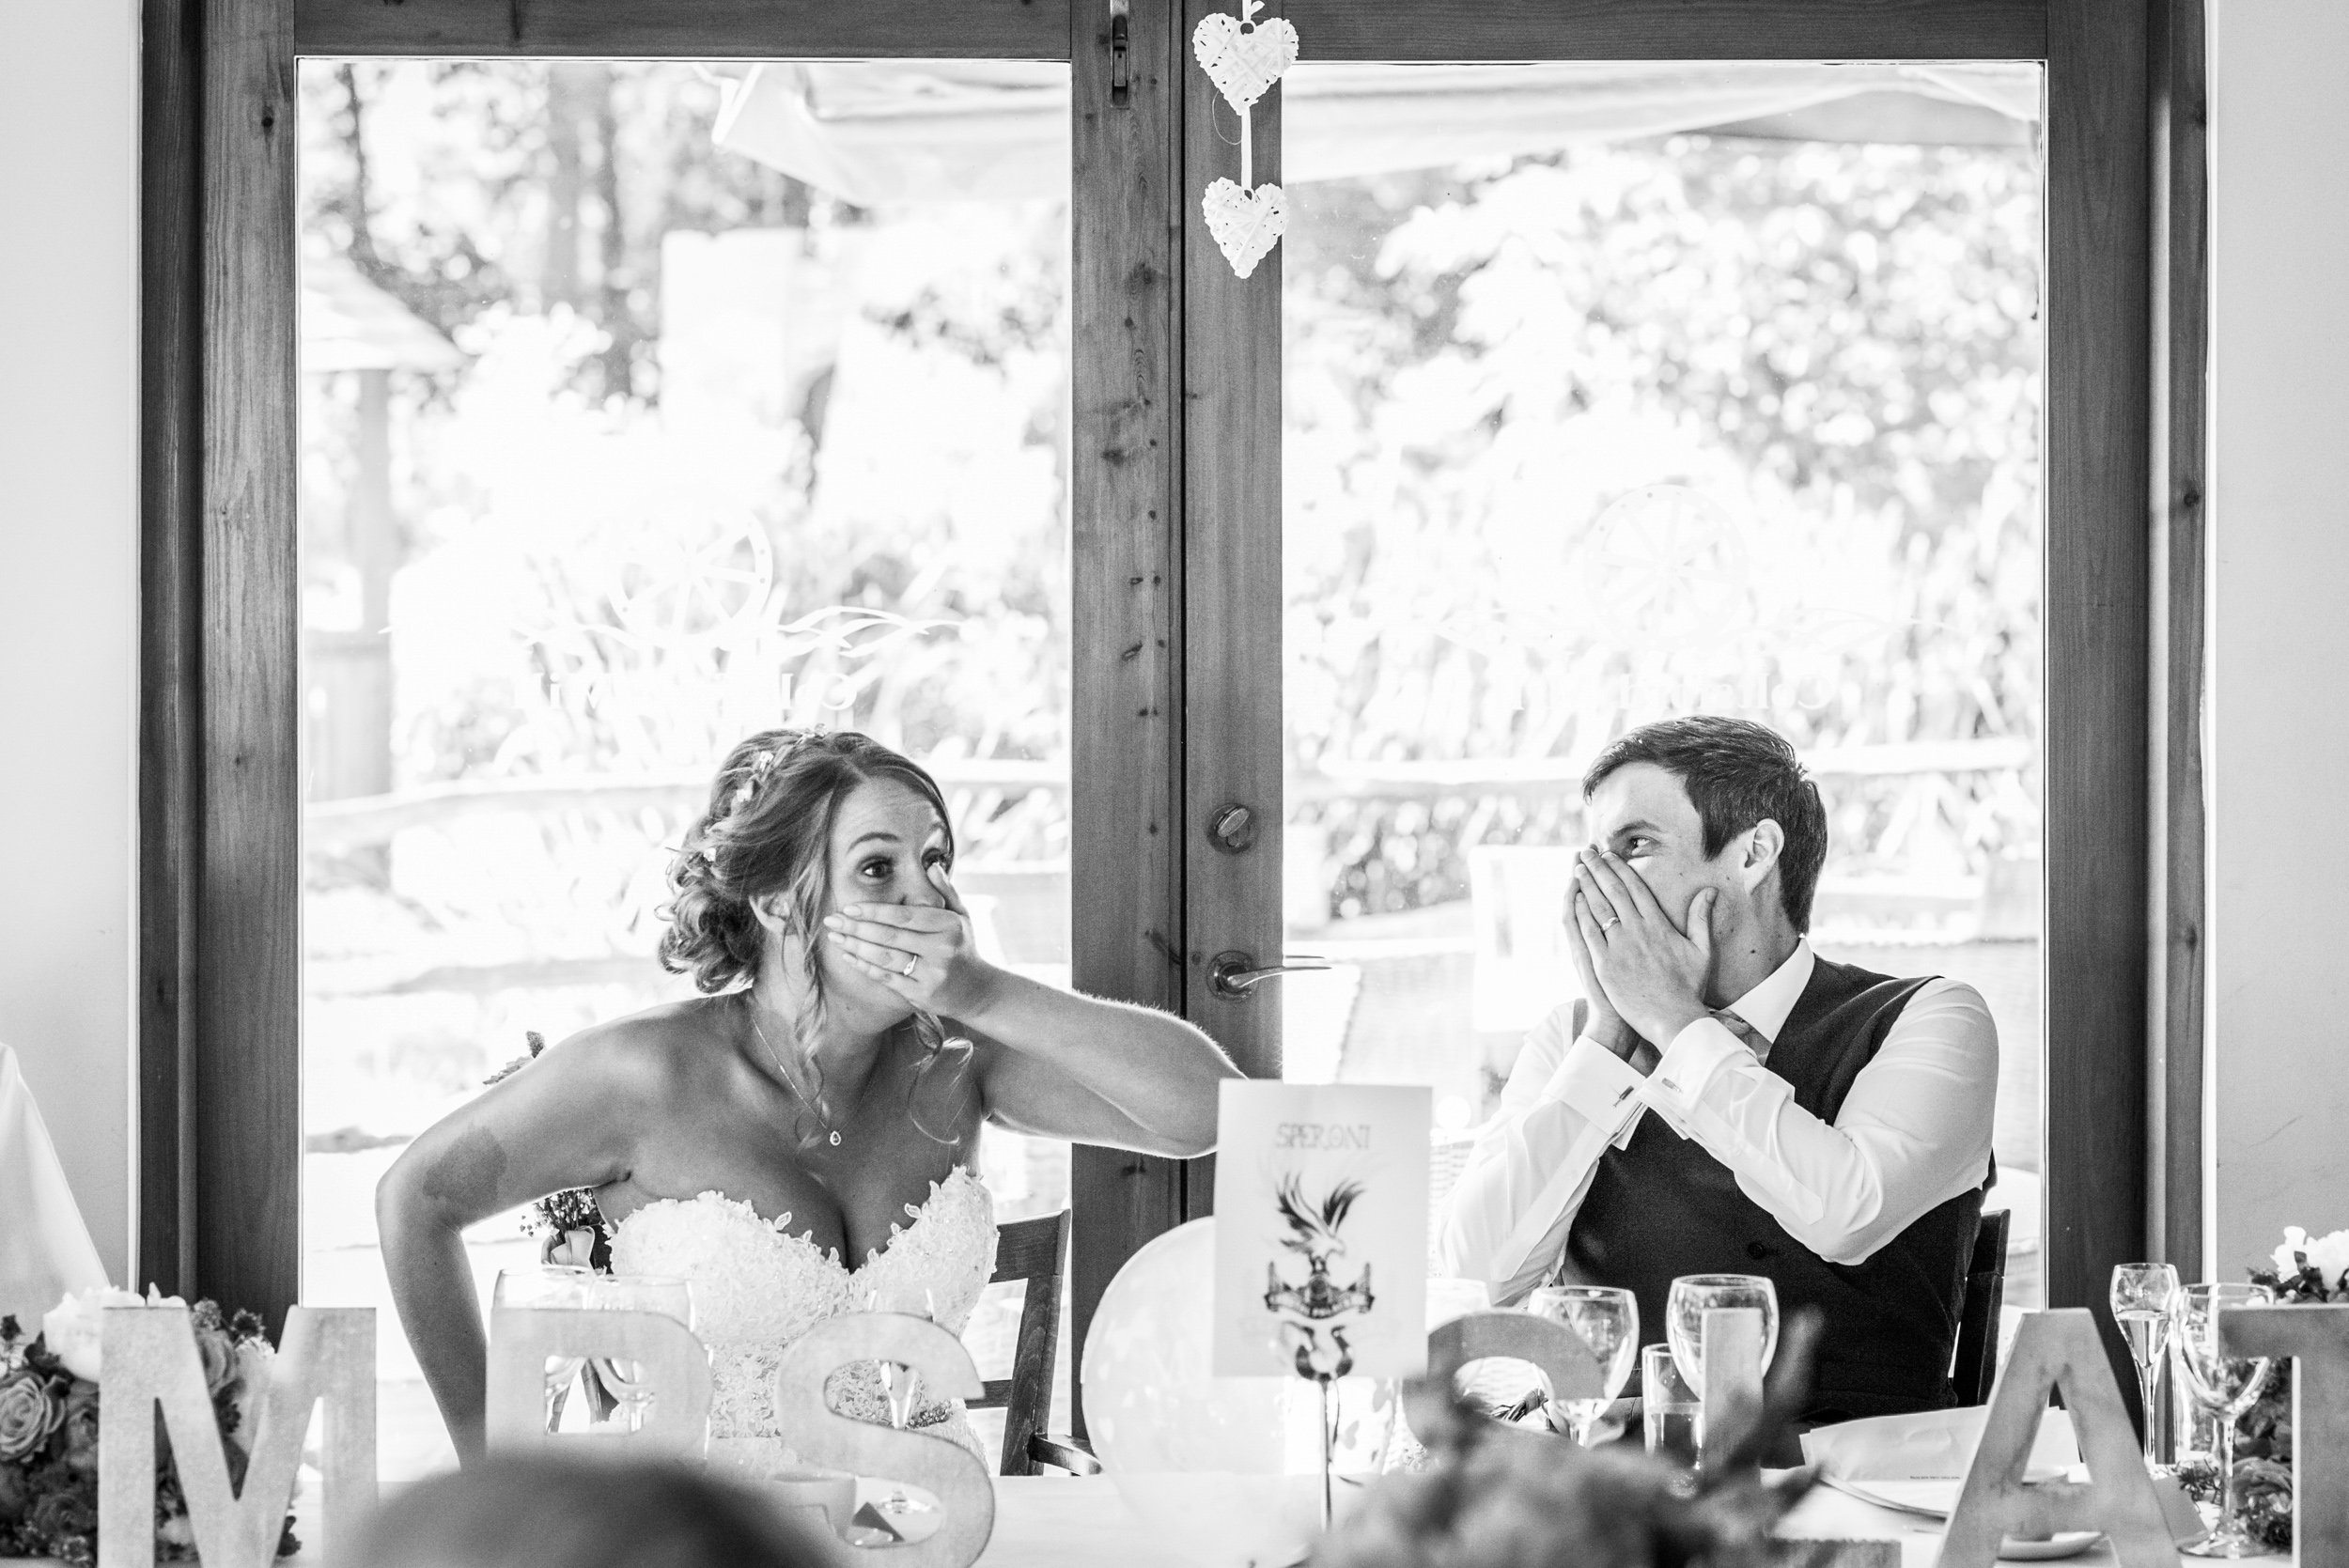 David Scholes Lancashire wedding photography 2016-24.jpg